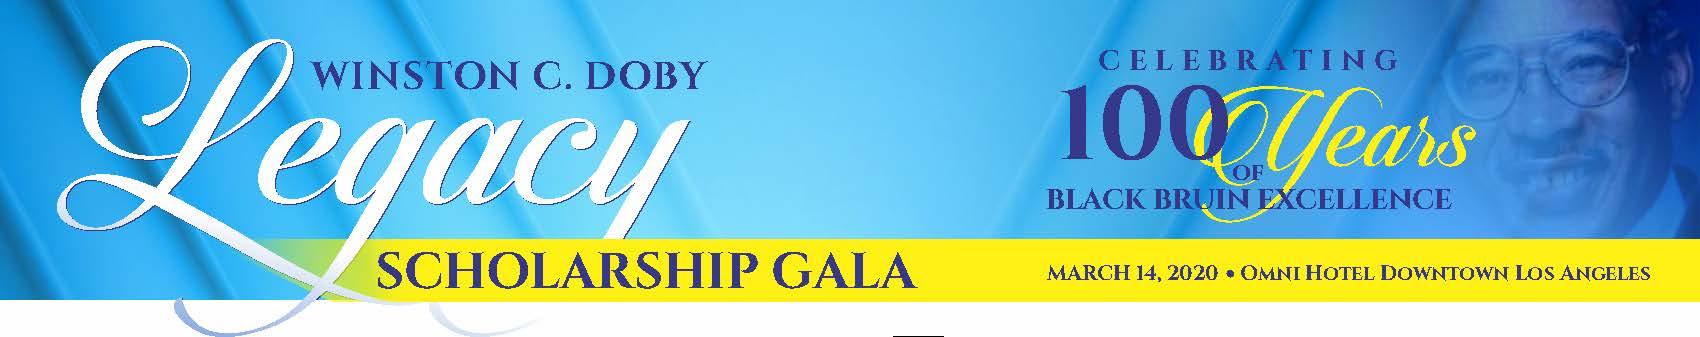 Winston C. Doby Legacy Scholarship Gala Ad Book